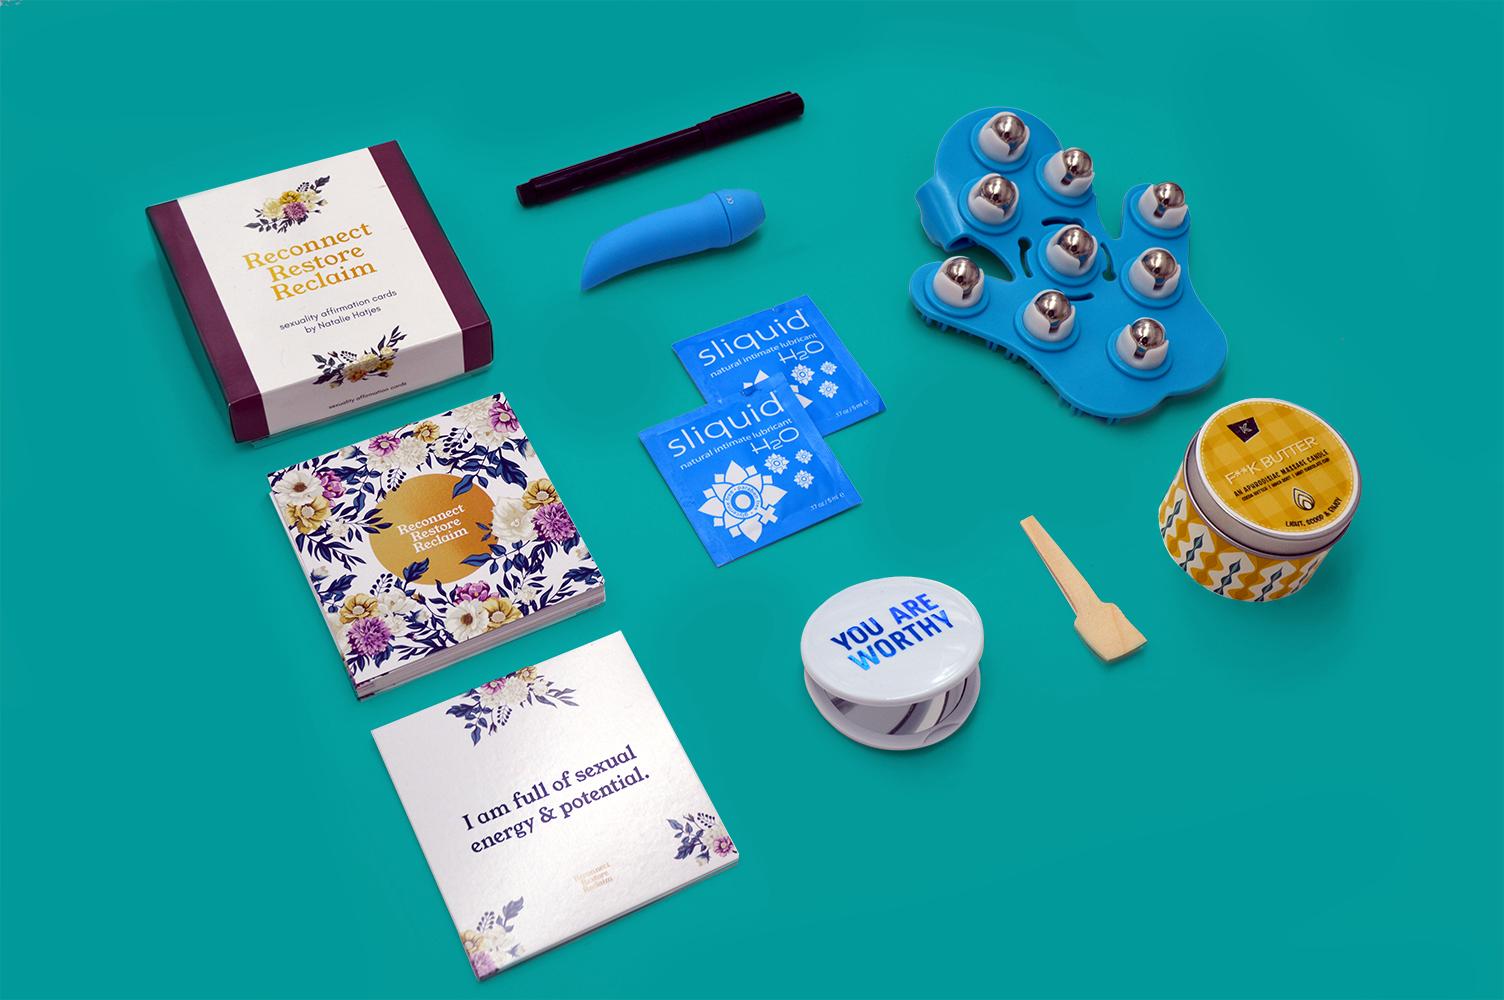 Healing Kit items.png